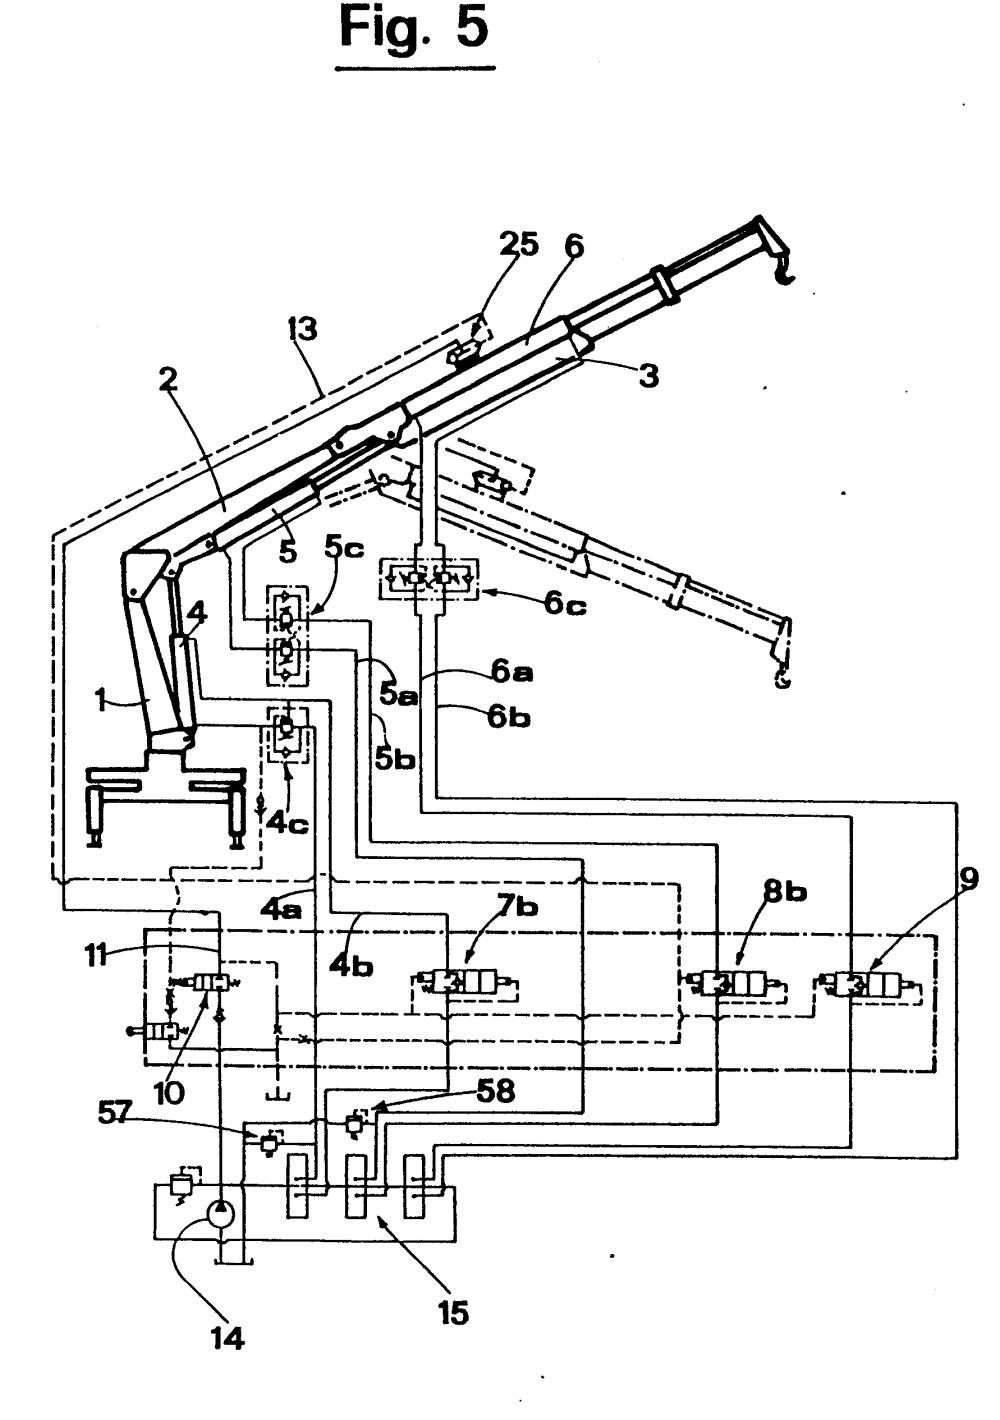 medium resolution of mobile crane electrical diagram national crane wiring diagram diagrams